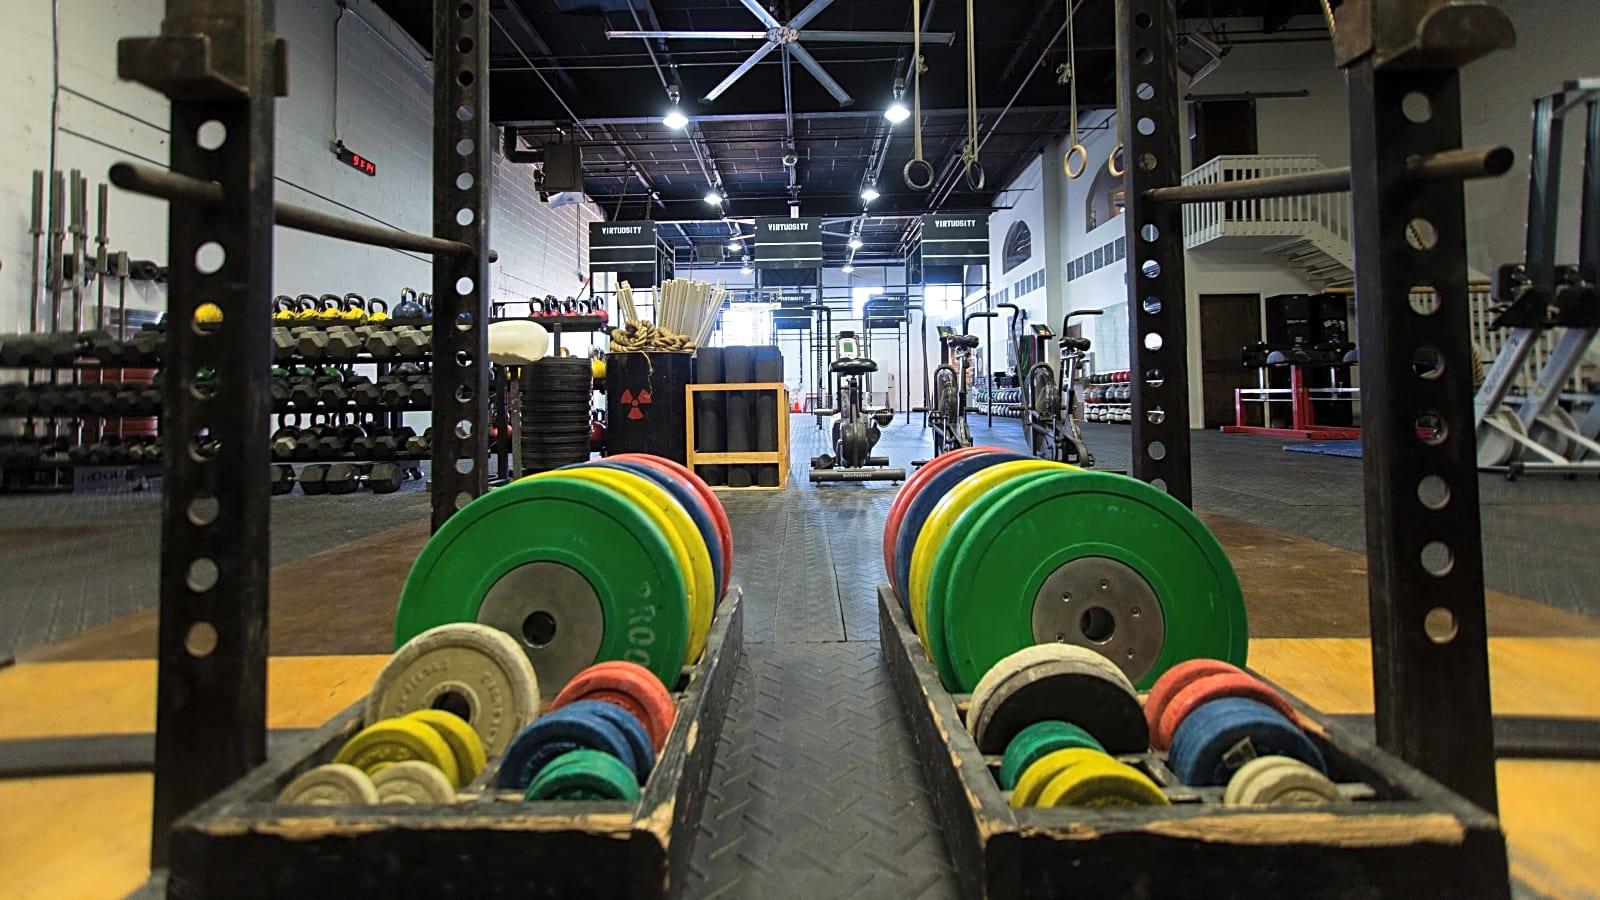 Fitness warehouse garage gym event space williamsburg new york